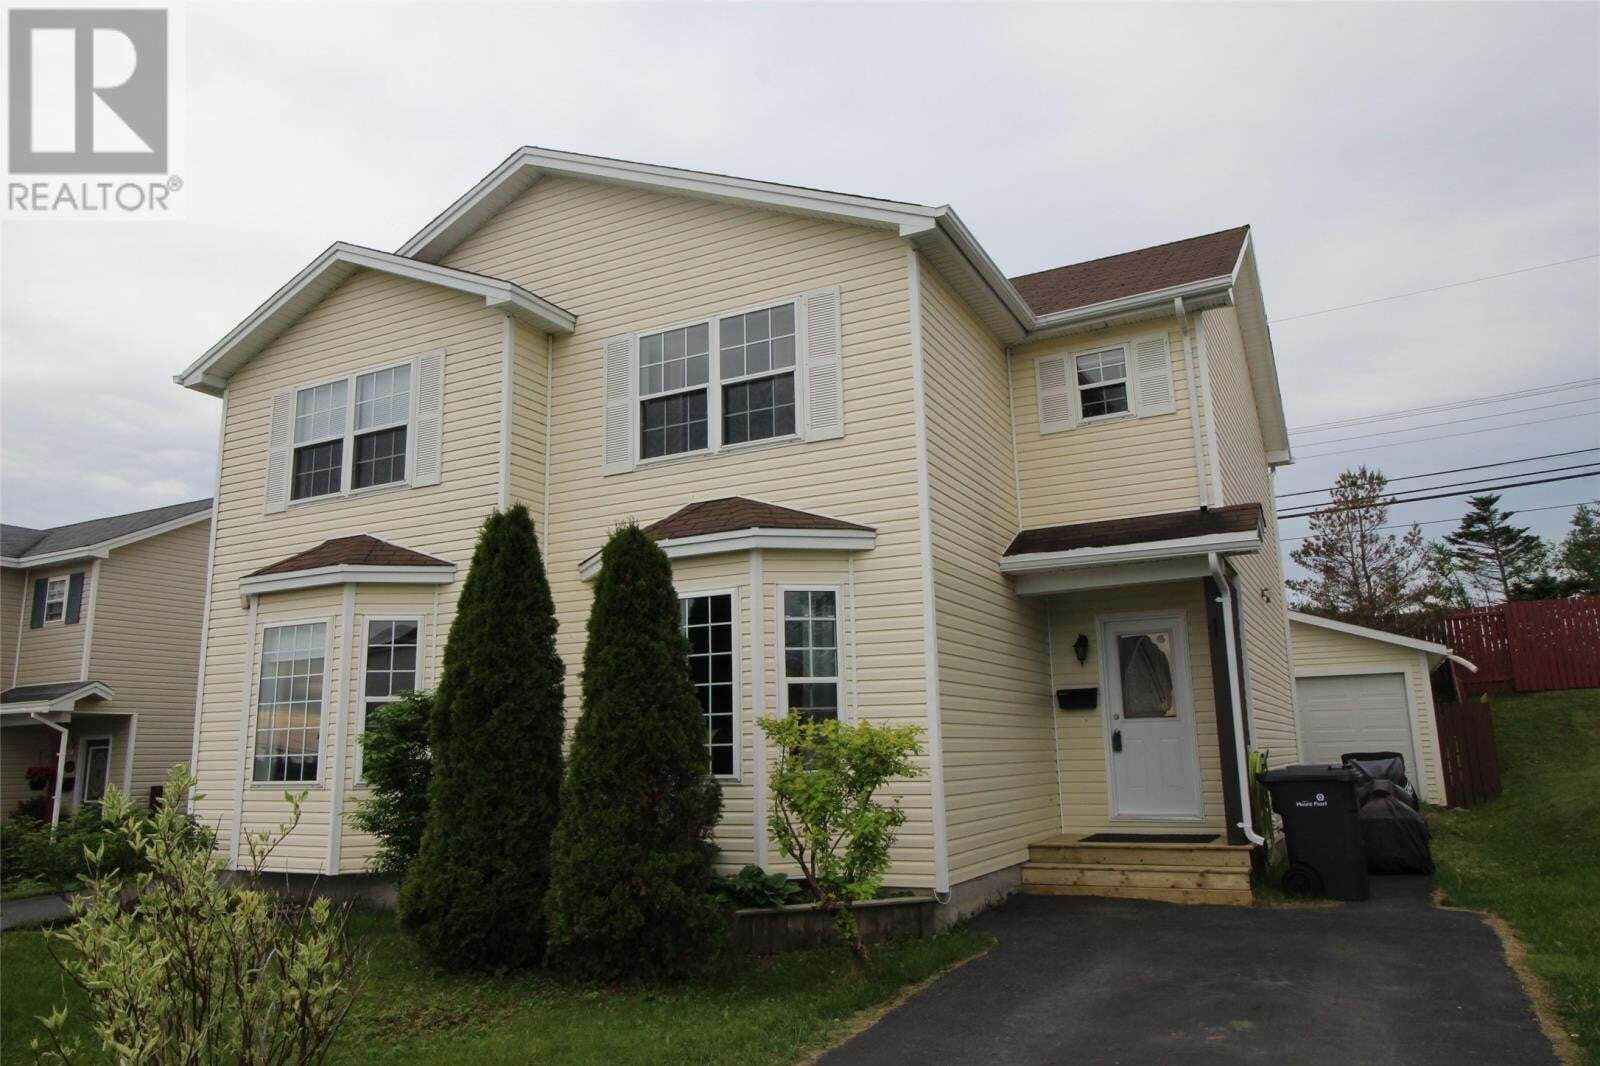 House for sale at 21 Laumann Pl Mt. Pearl Newfoundland - MLS: 1216781